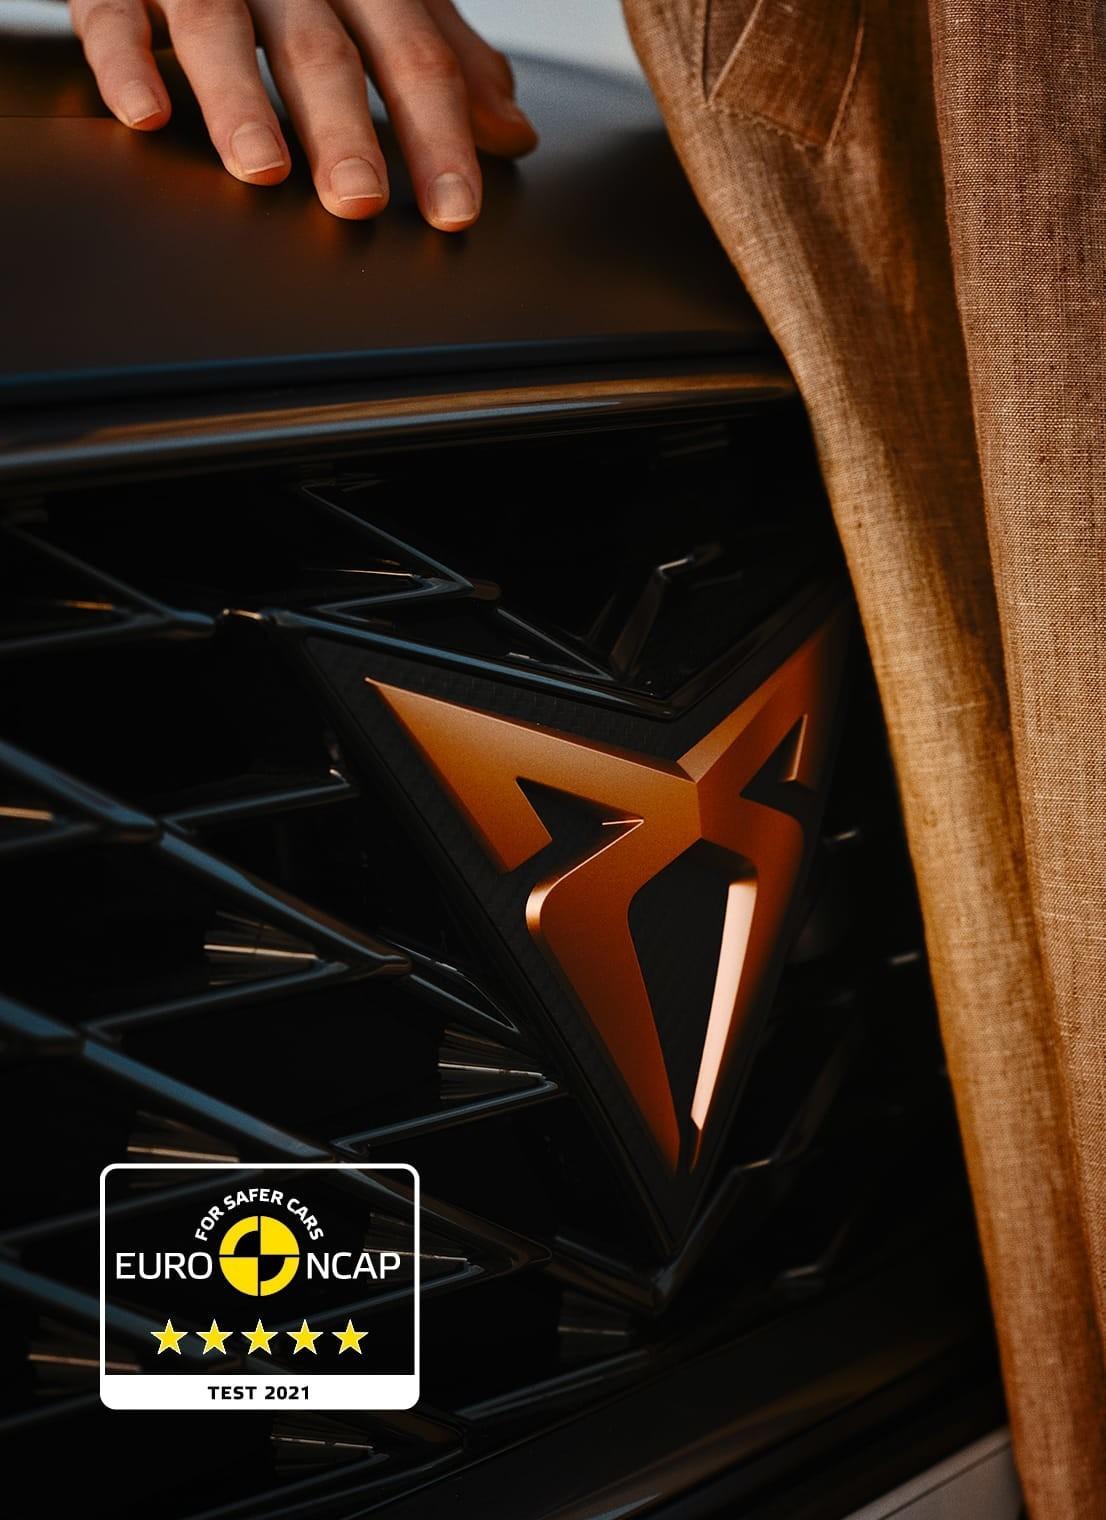 cupra-formentor-5-star-euro-ncap-rating.jpg